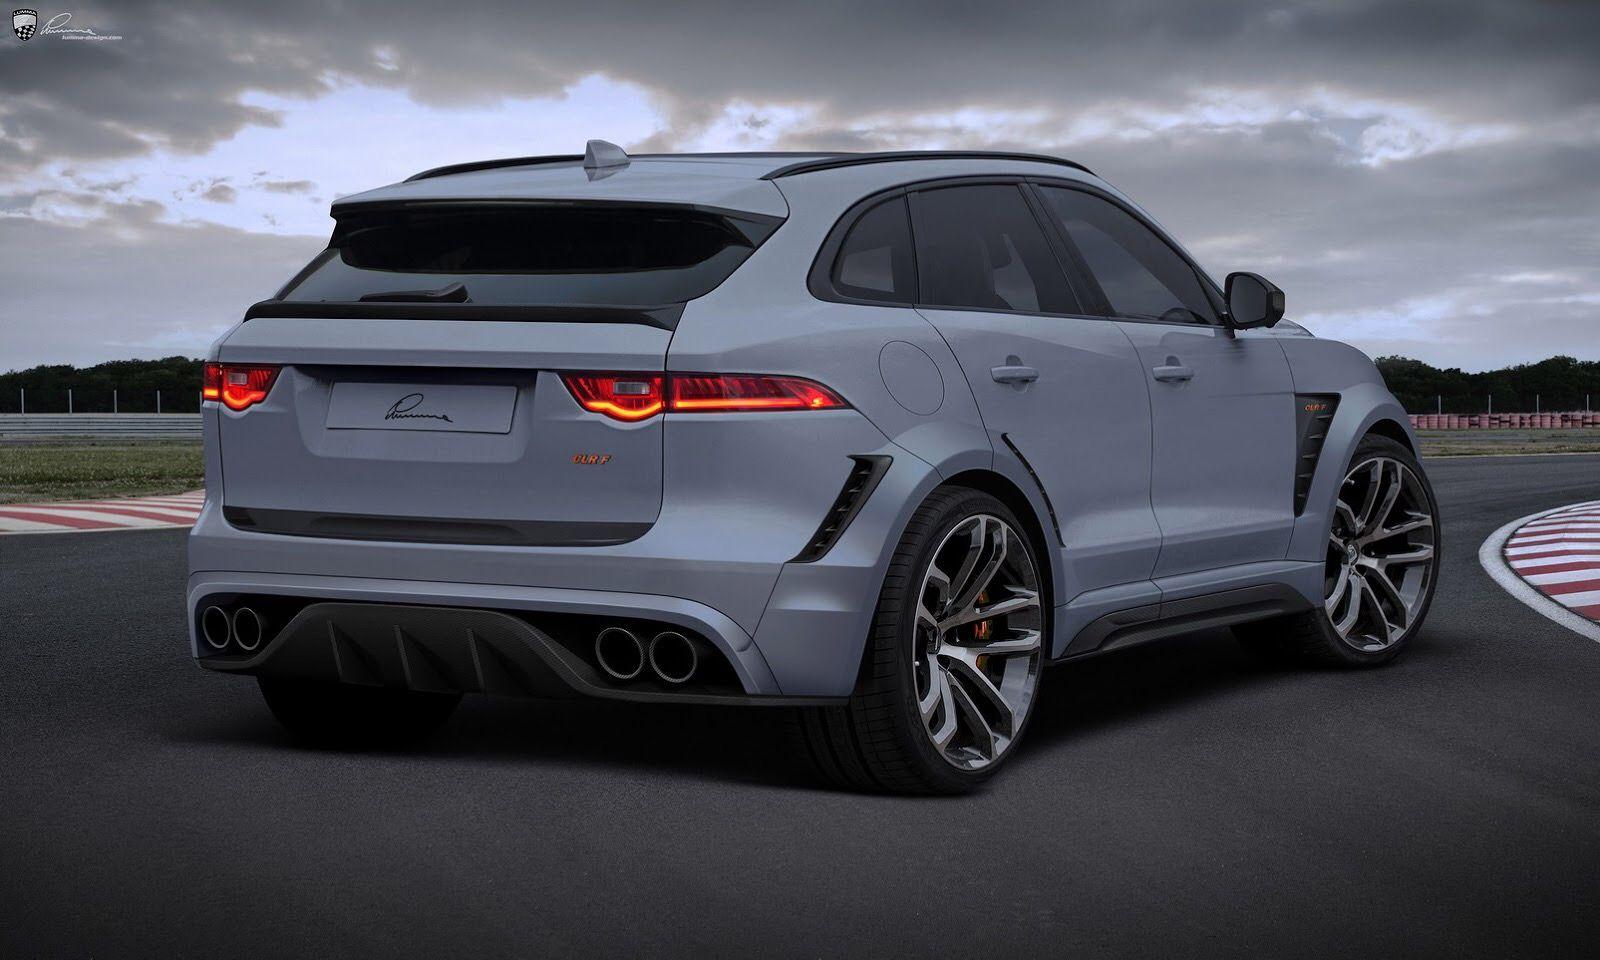 jaguar f pace garage pinterest cars dream cars and 4x4. Black Bedroom Furniture Sets. Home Design Ideas